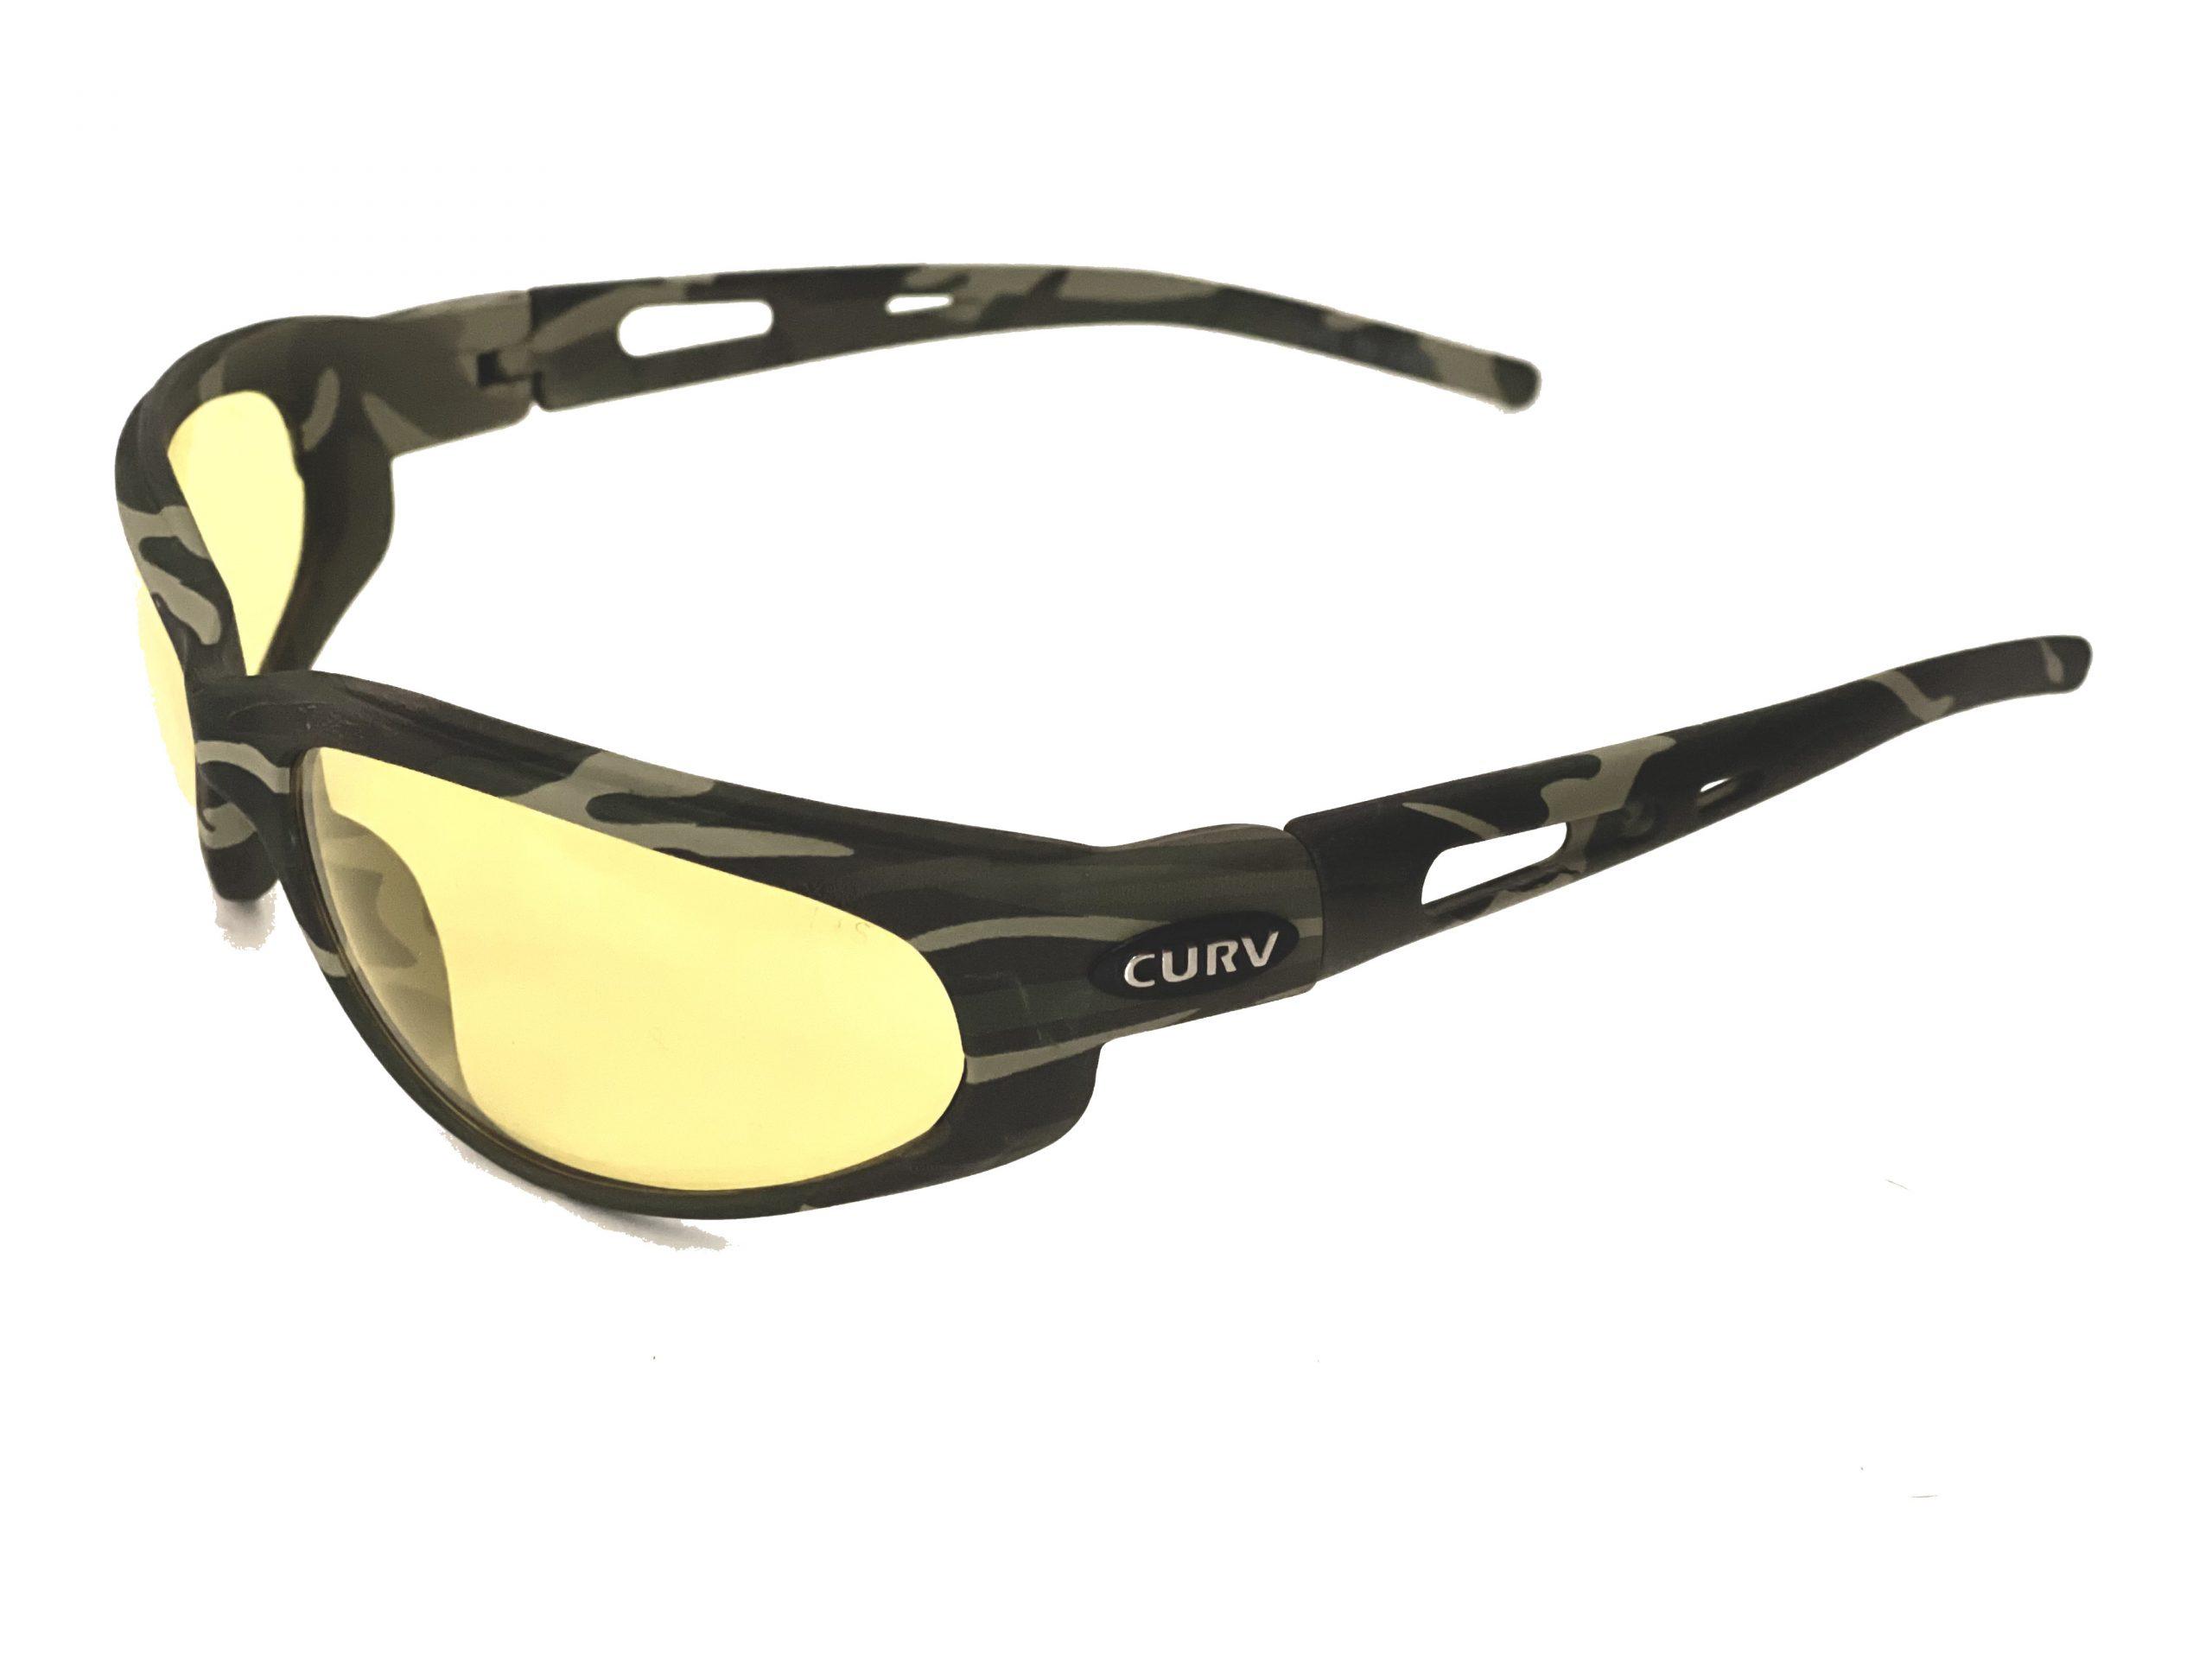 01-30 - Curv Camo Frame Sunglasses with Yellow Lenses